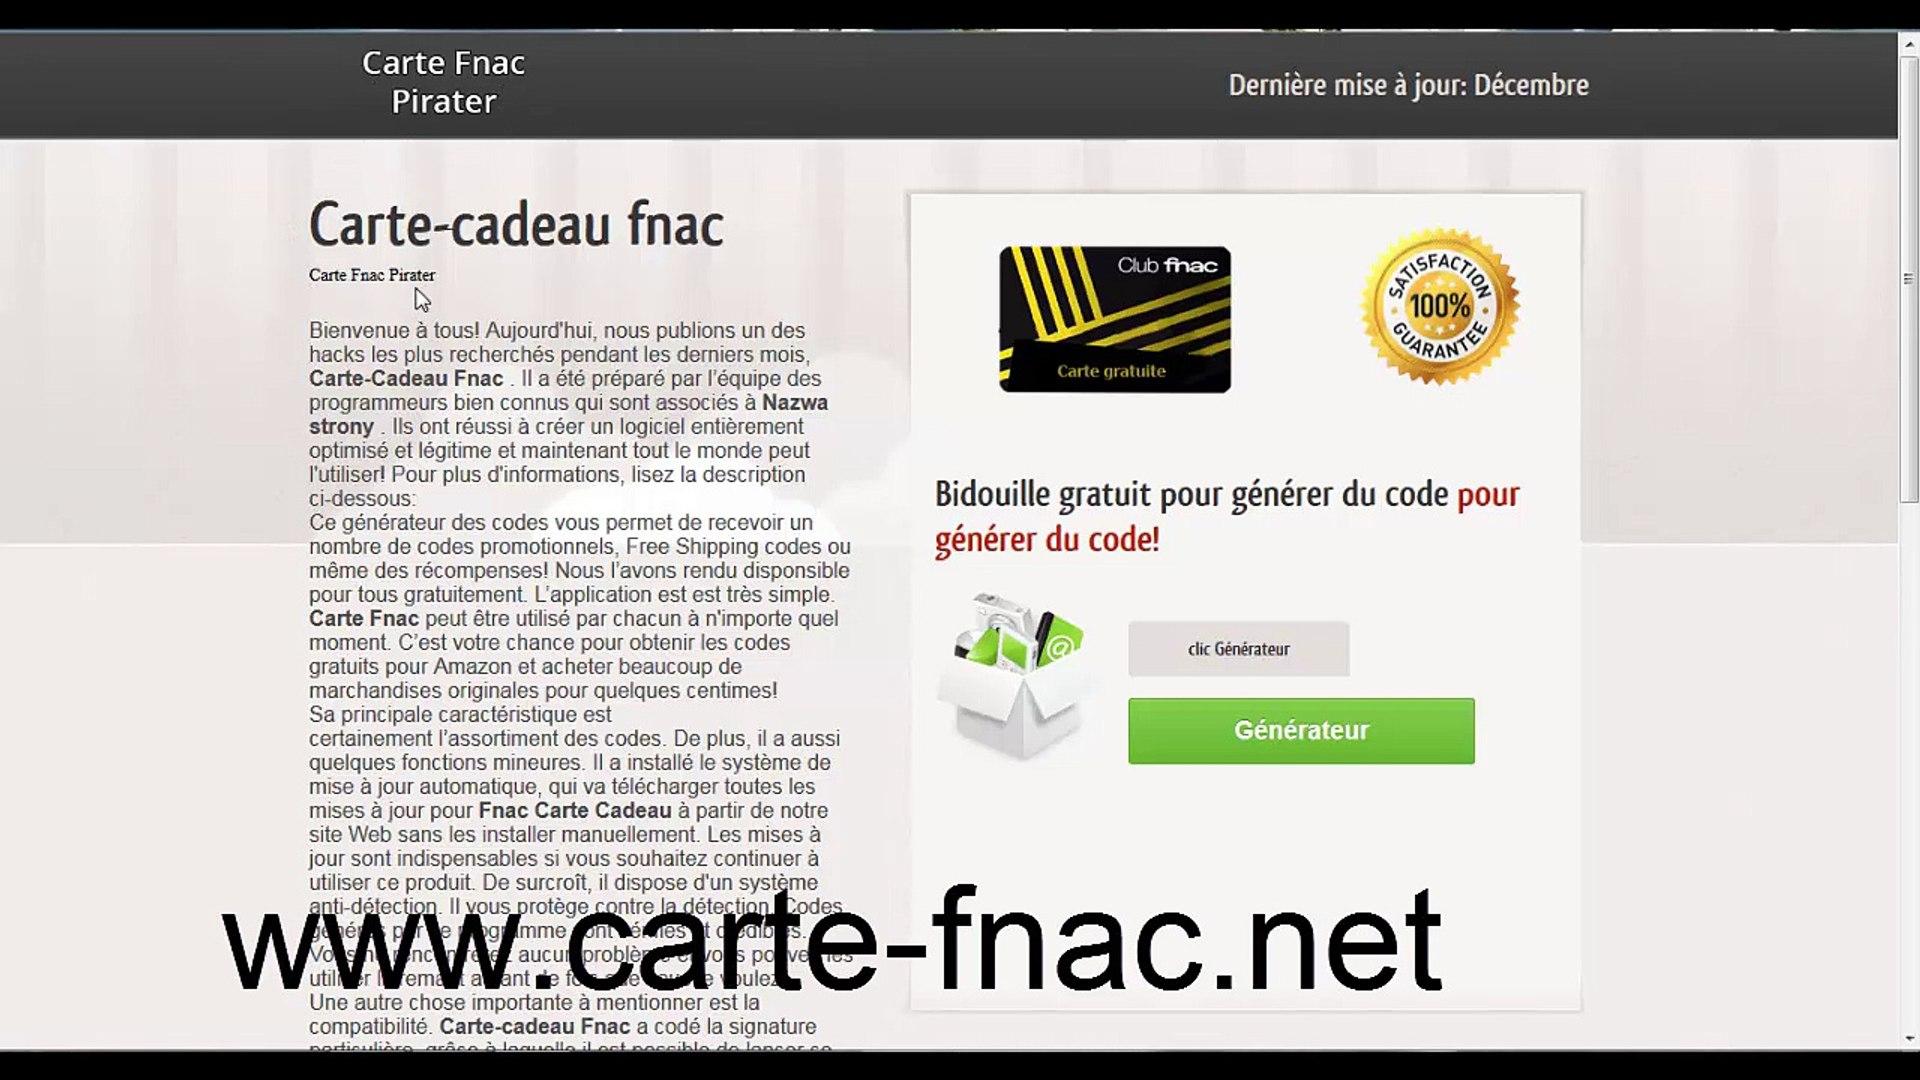 Carte American Express Gold Fnac.Carte Cadeau Fnac